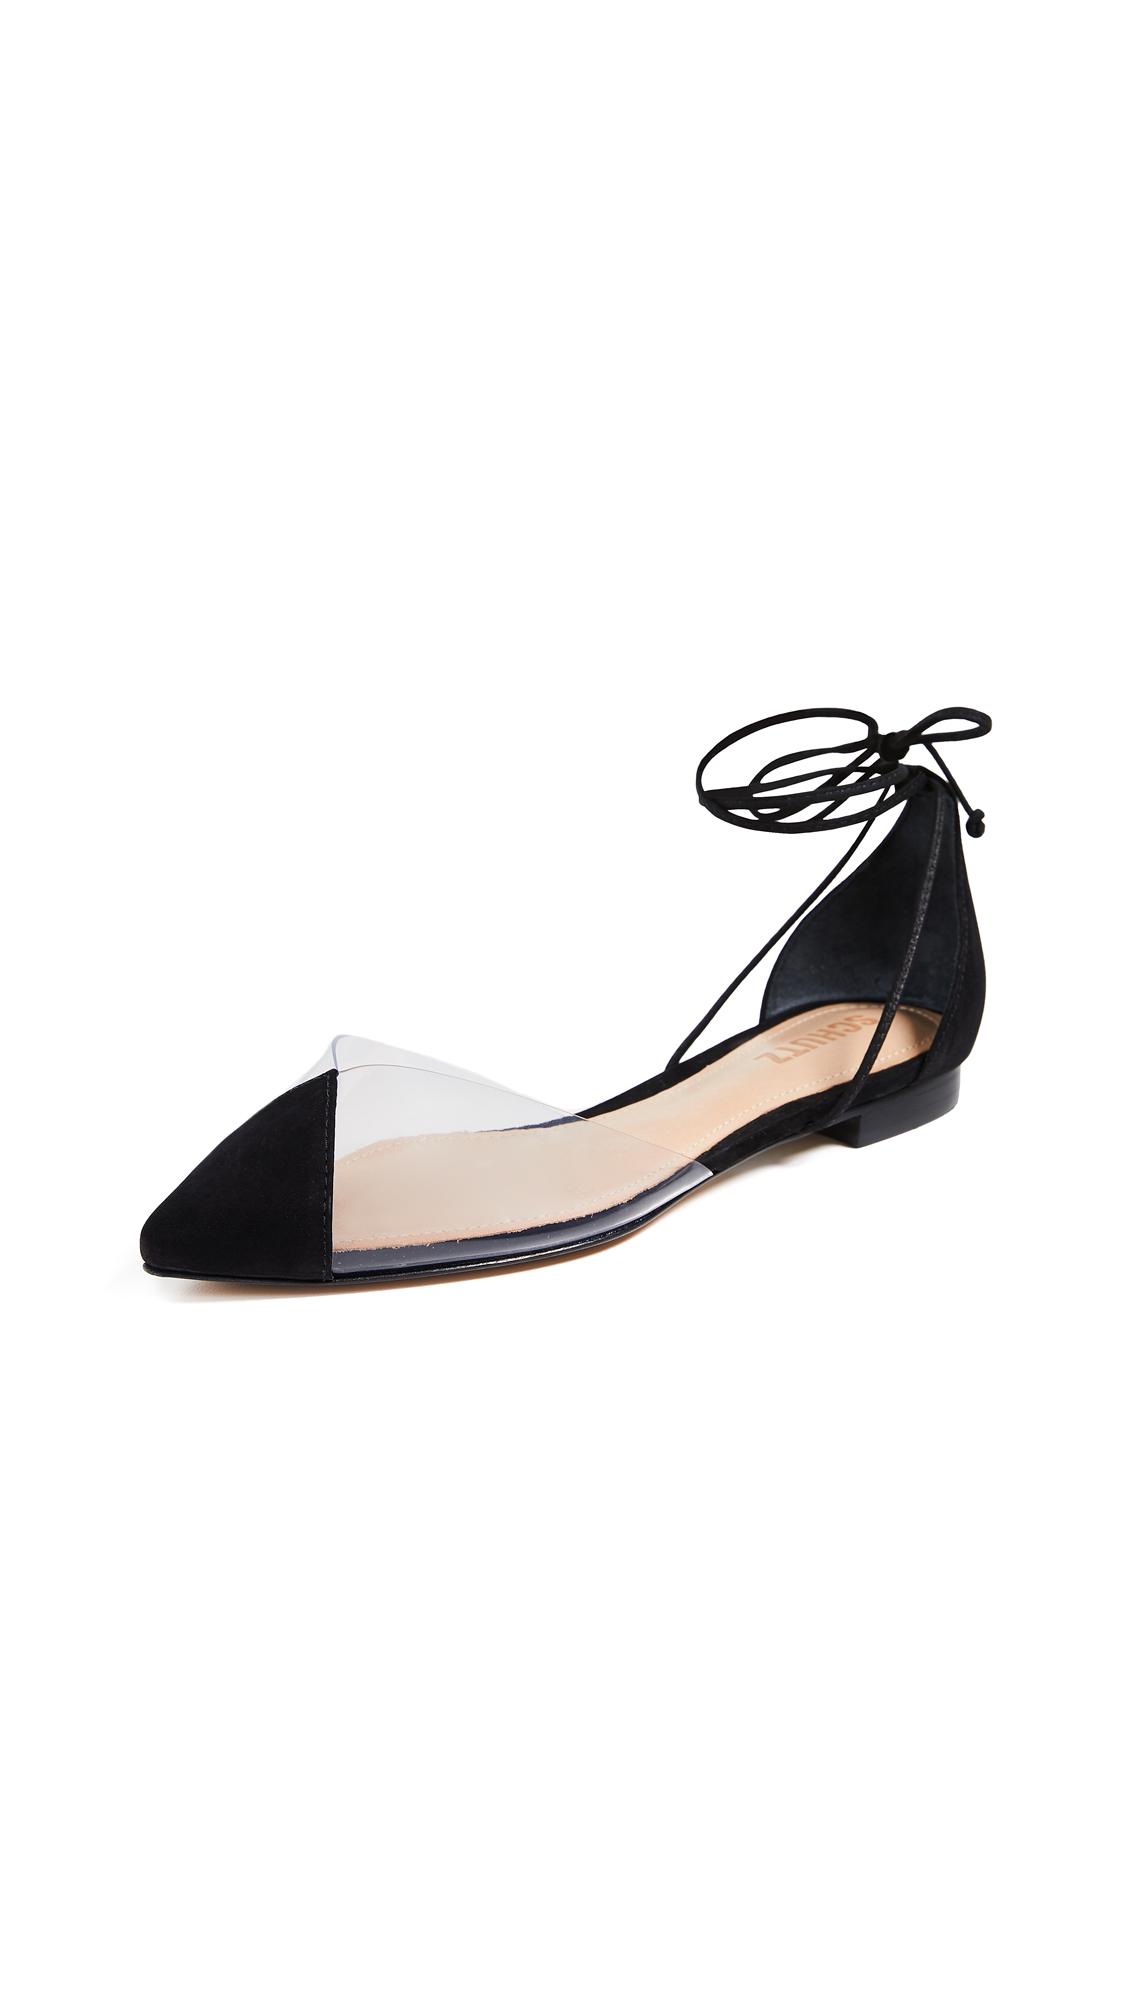 Schutz Merry Point Toe Flats - Black/Transparent